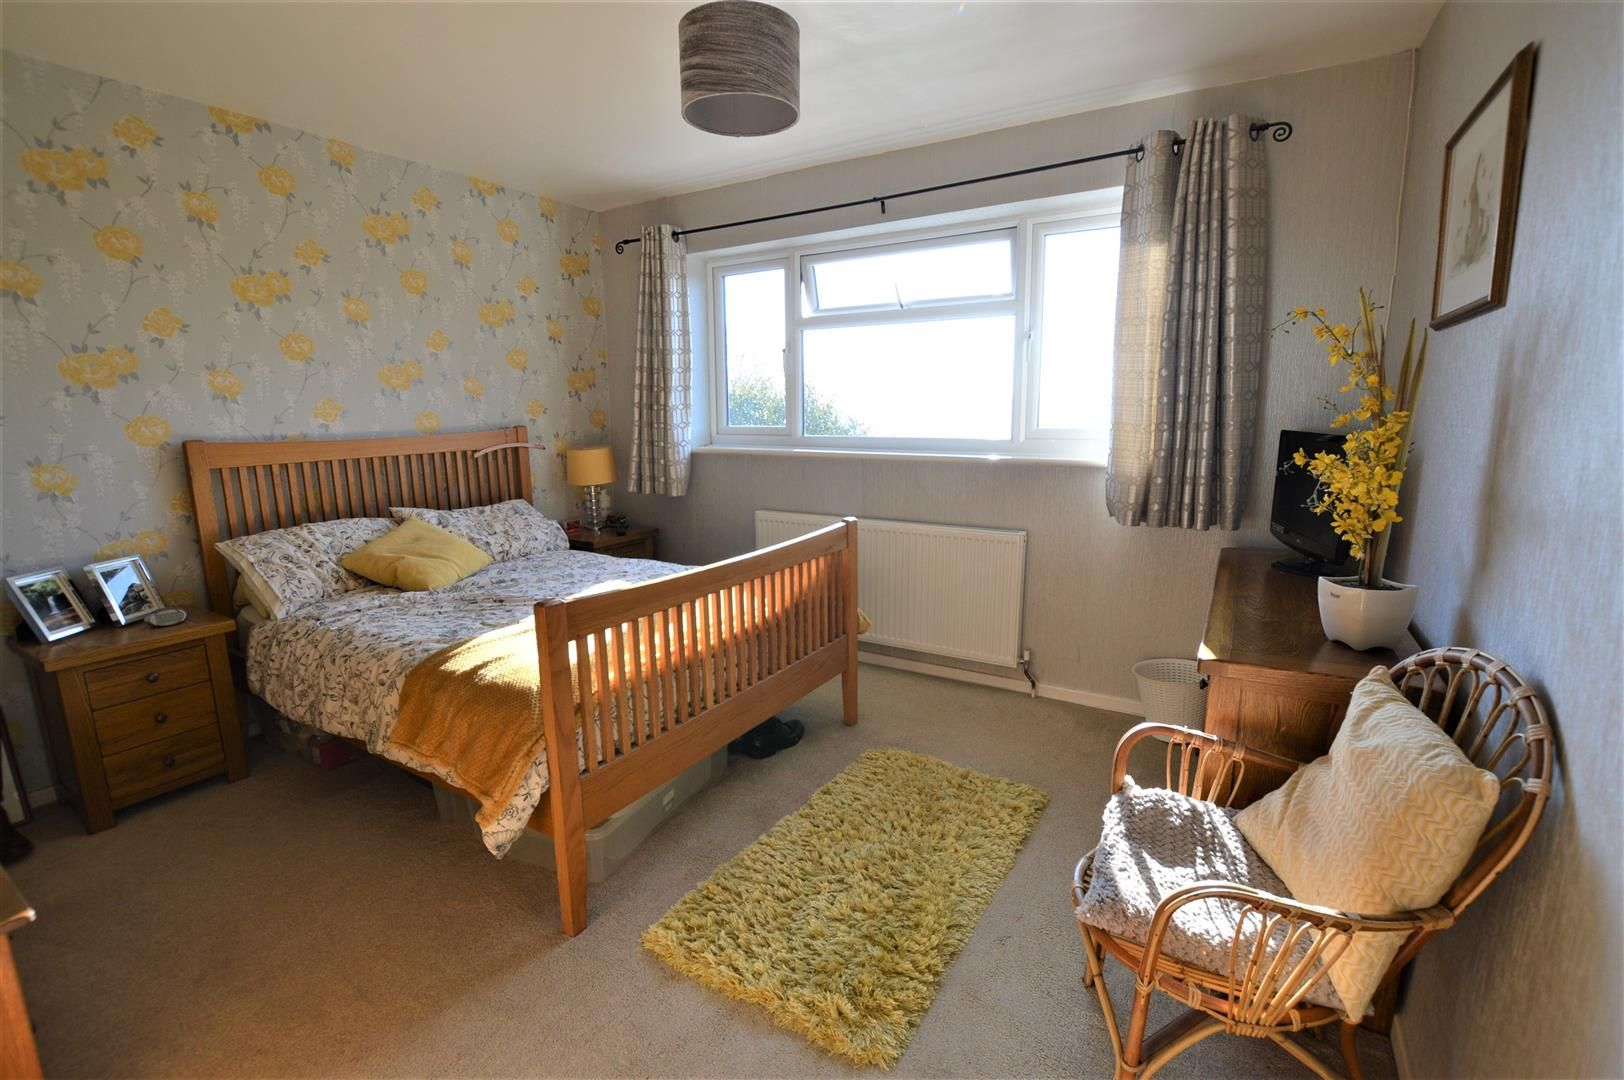 4 bed semi-detached for sale in Bromyard 6